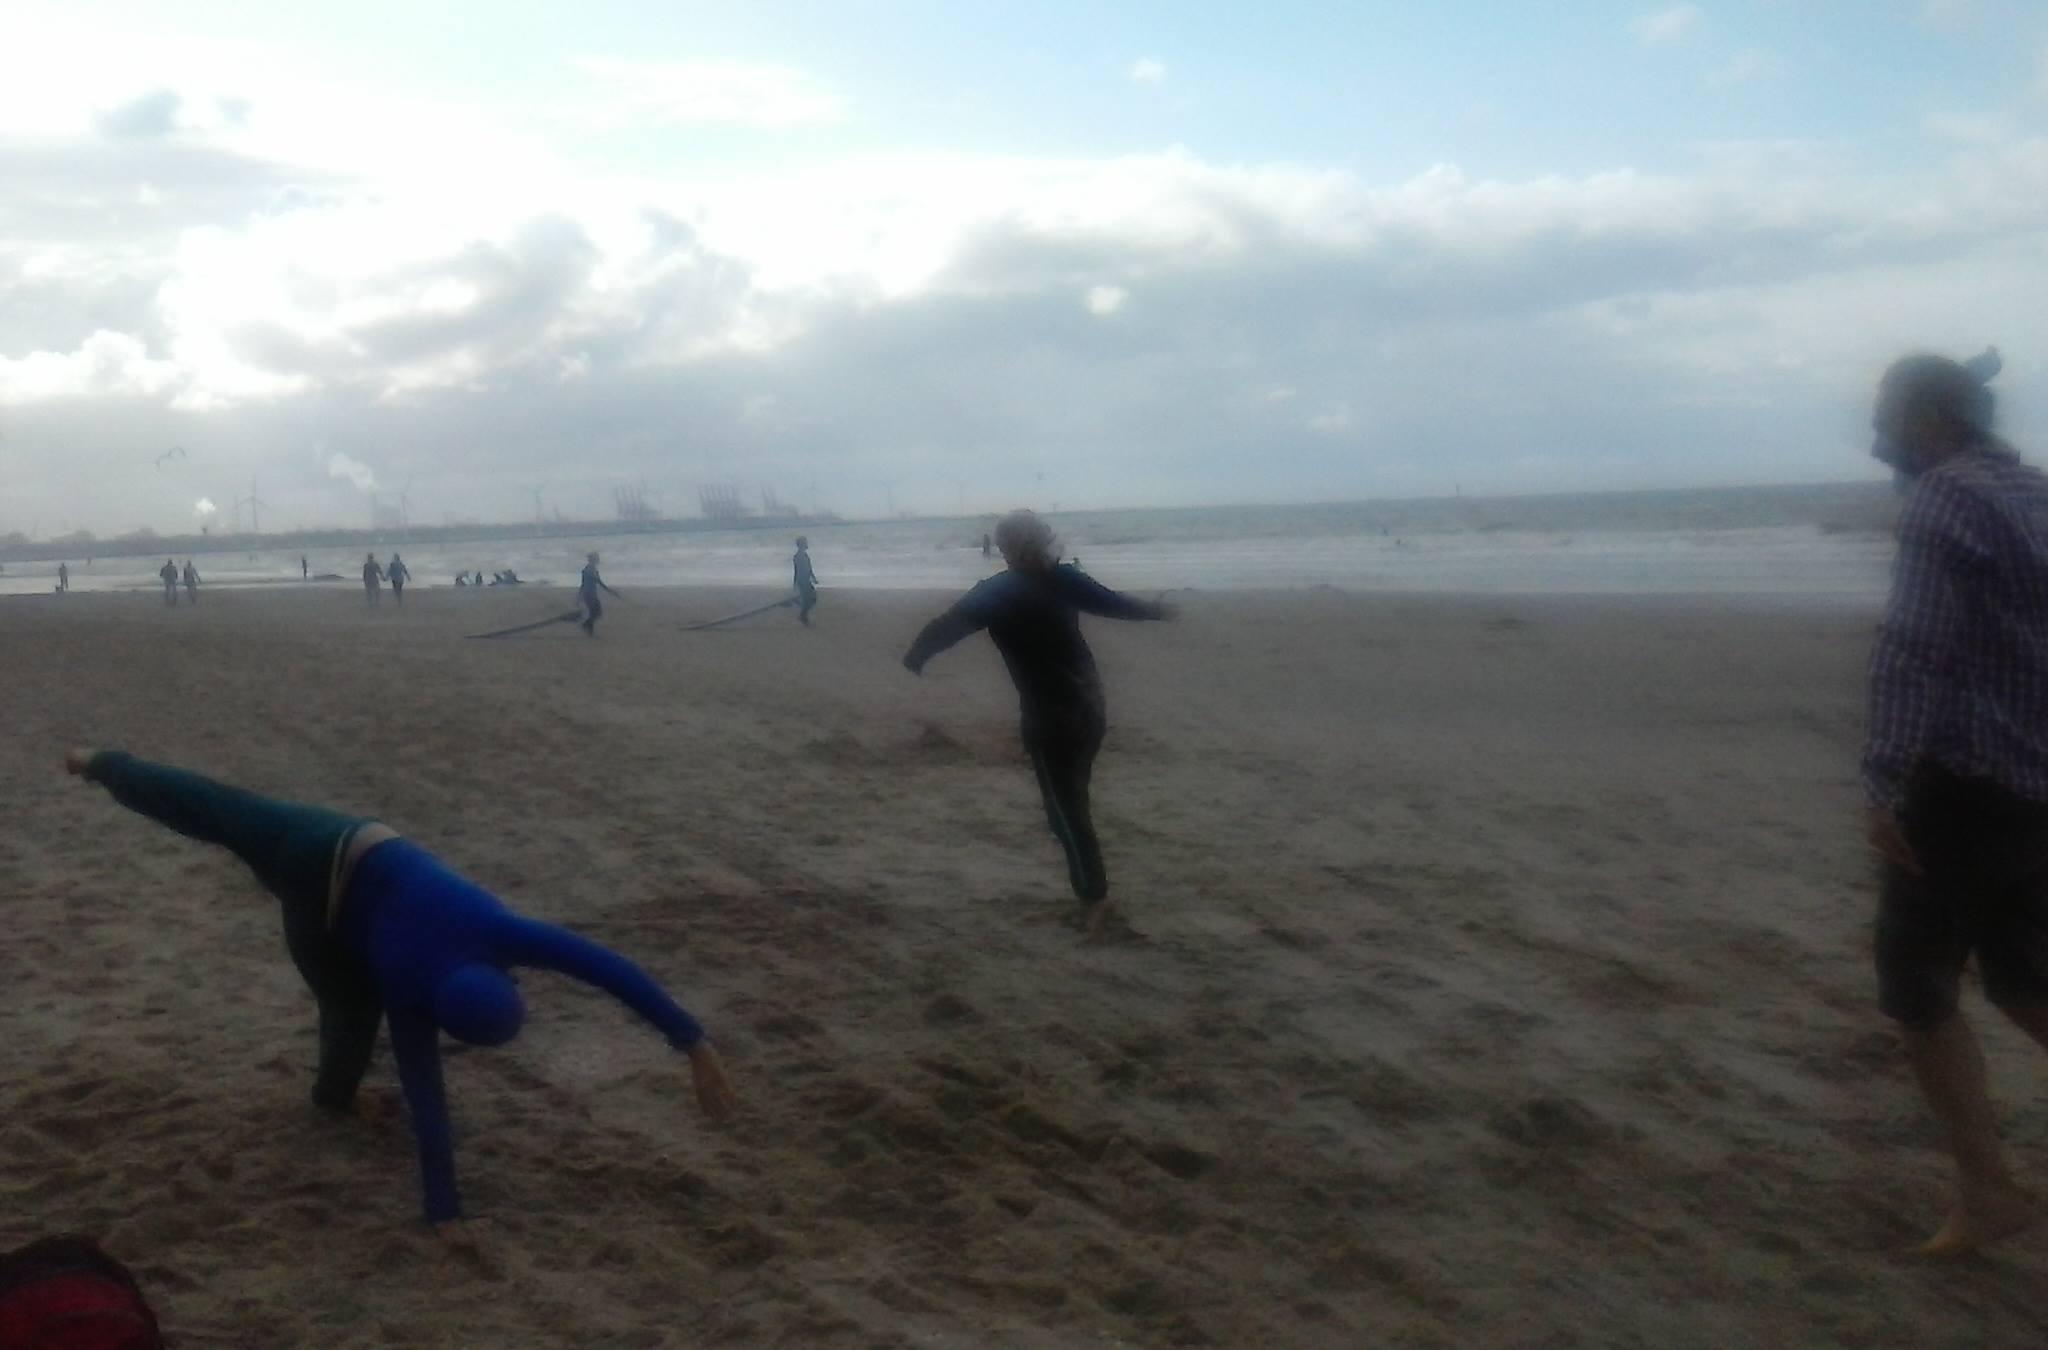 dansen op 't strand 2016 - foto: Karin van Etten